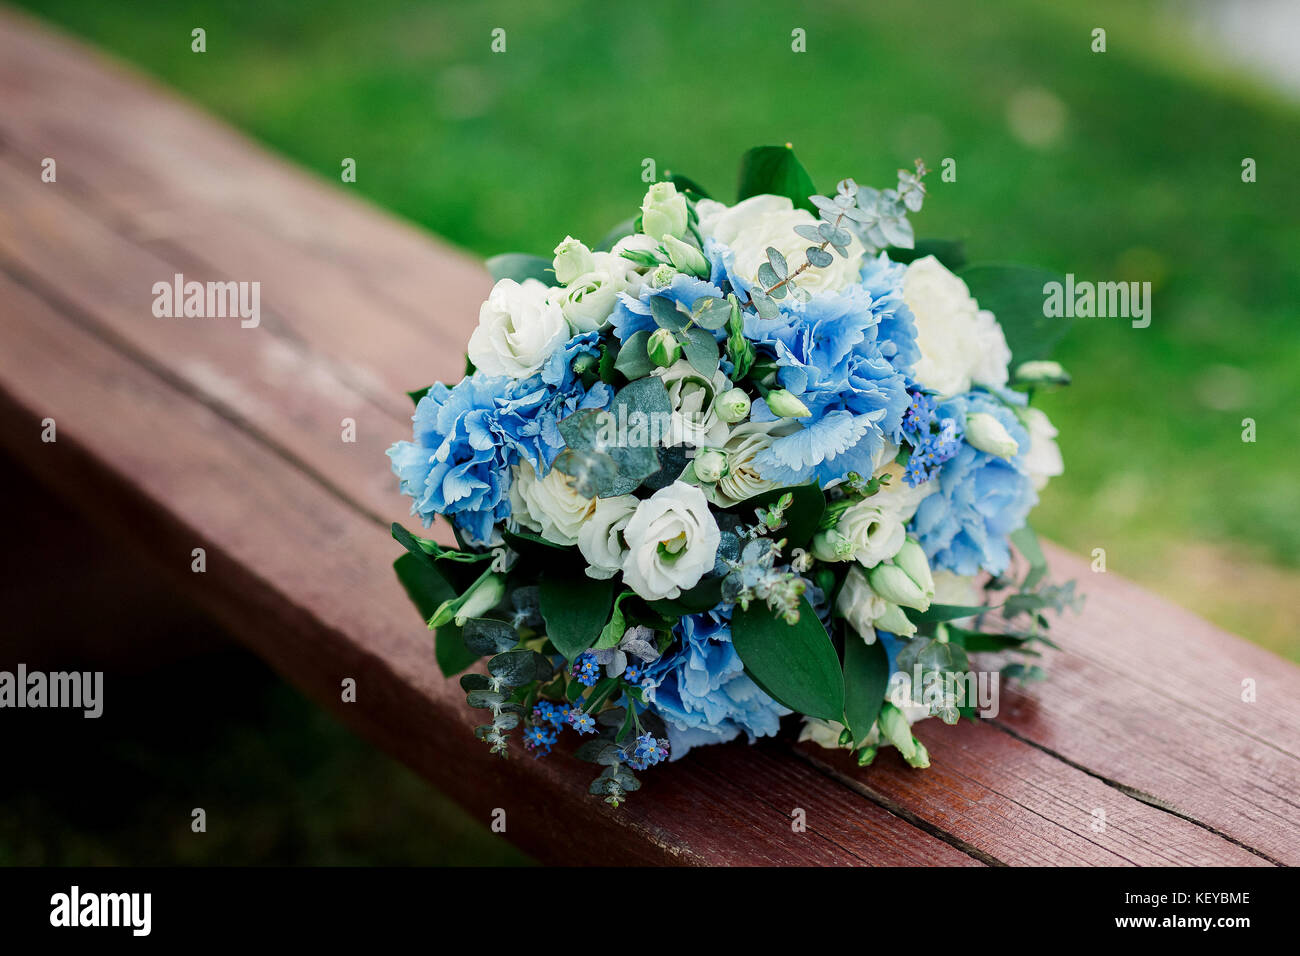 Hand bouquet pink red blue stock photos hand bouquet pink red blue beautiful blue and white fresh flowers wedding bouquet wedding details stock image izmirmasajfo